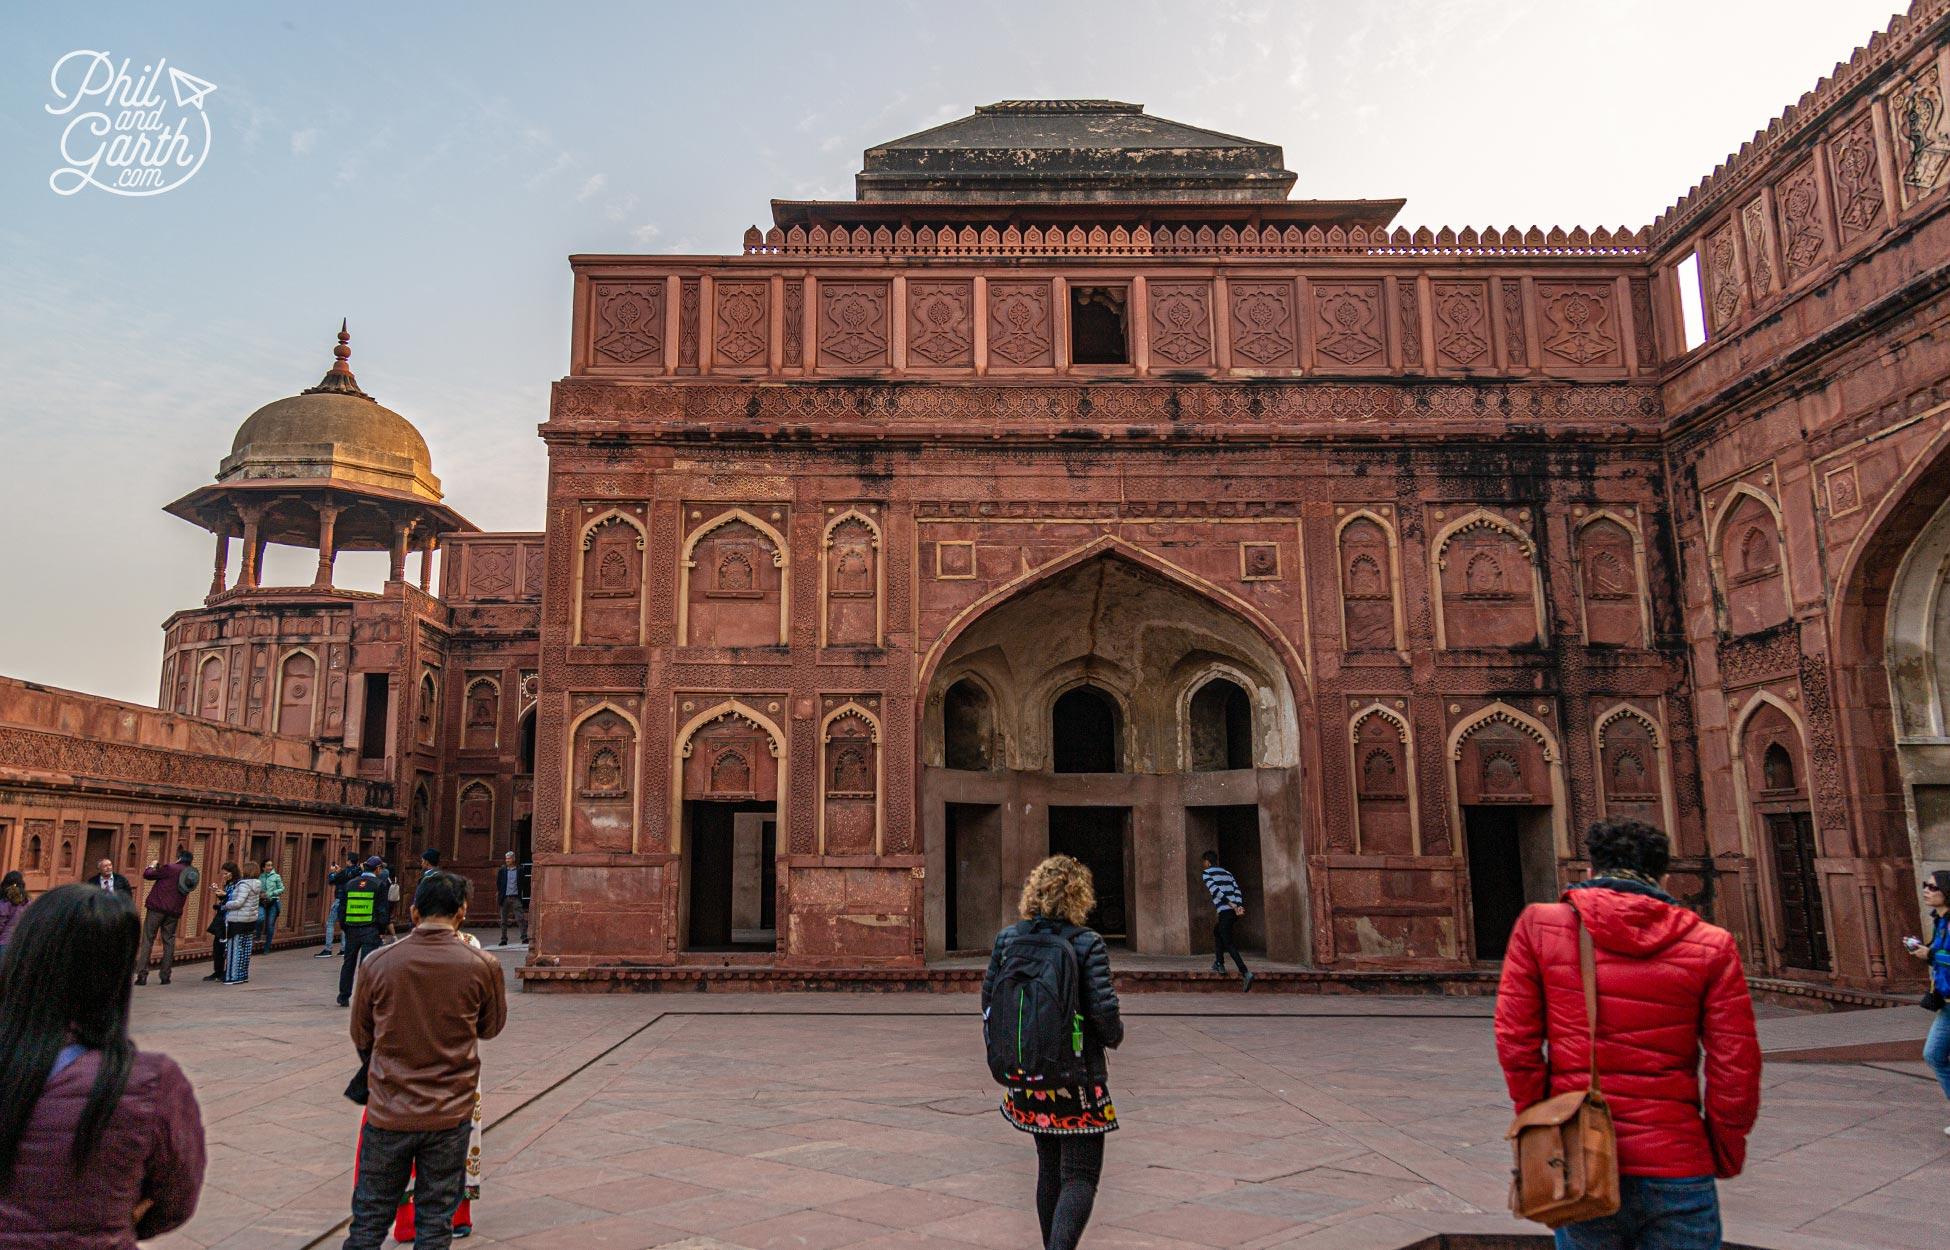 The Riverfront Courtyard of the Jahangiri Mahal Palace